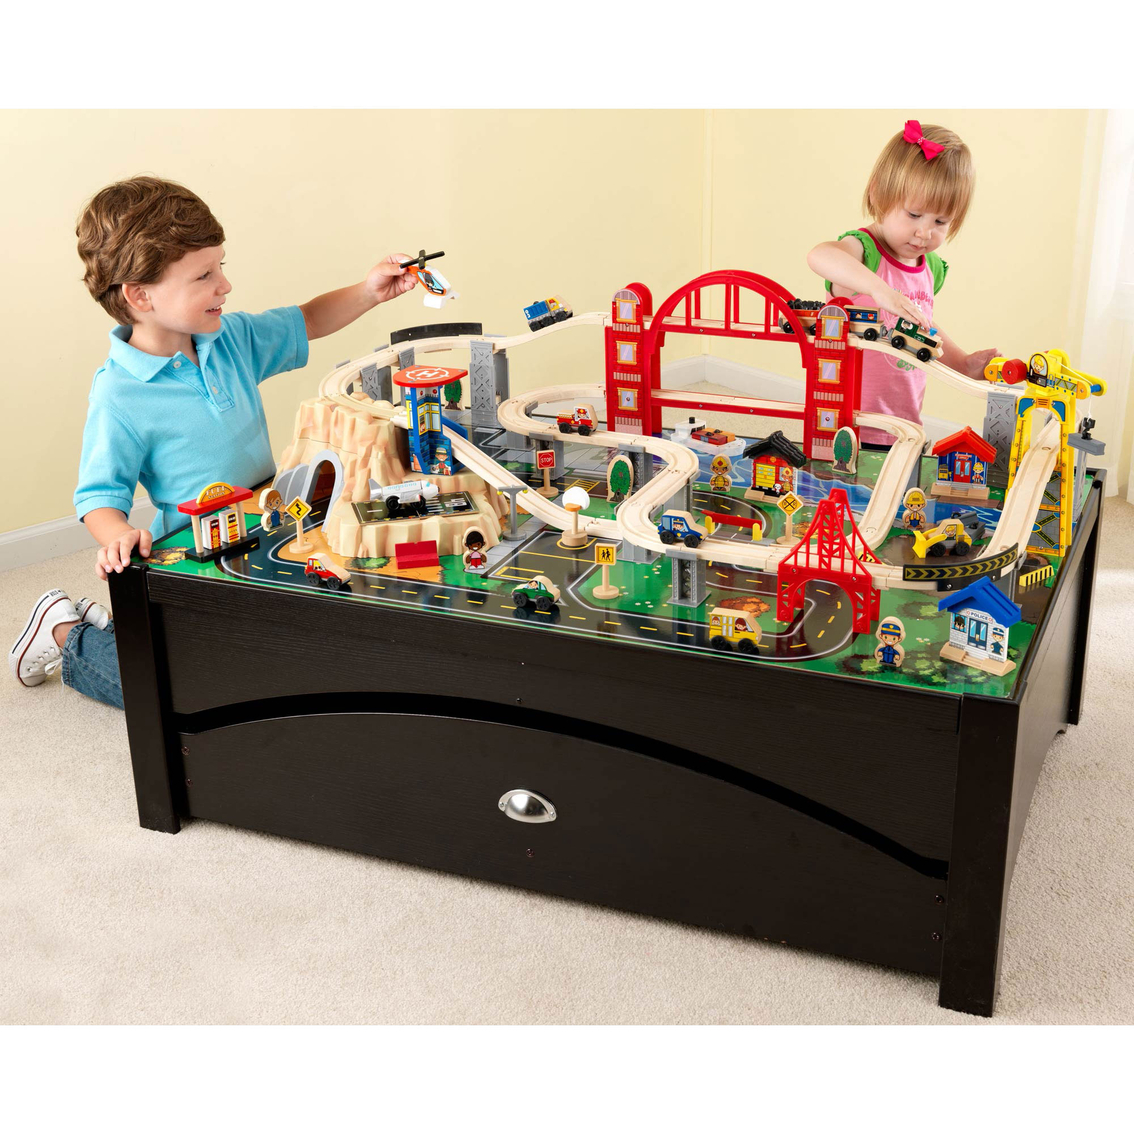 2201  sc 1 st  ShopMyExchange.com & Kidkraft Metropolis Train Table And Set | Tables u0026 Sets | Shop The ...